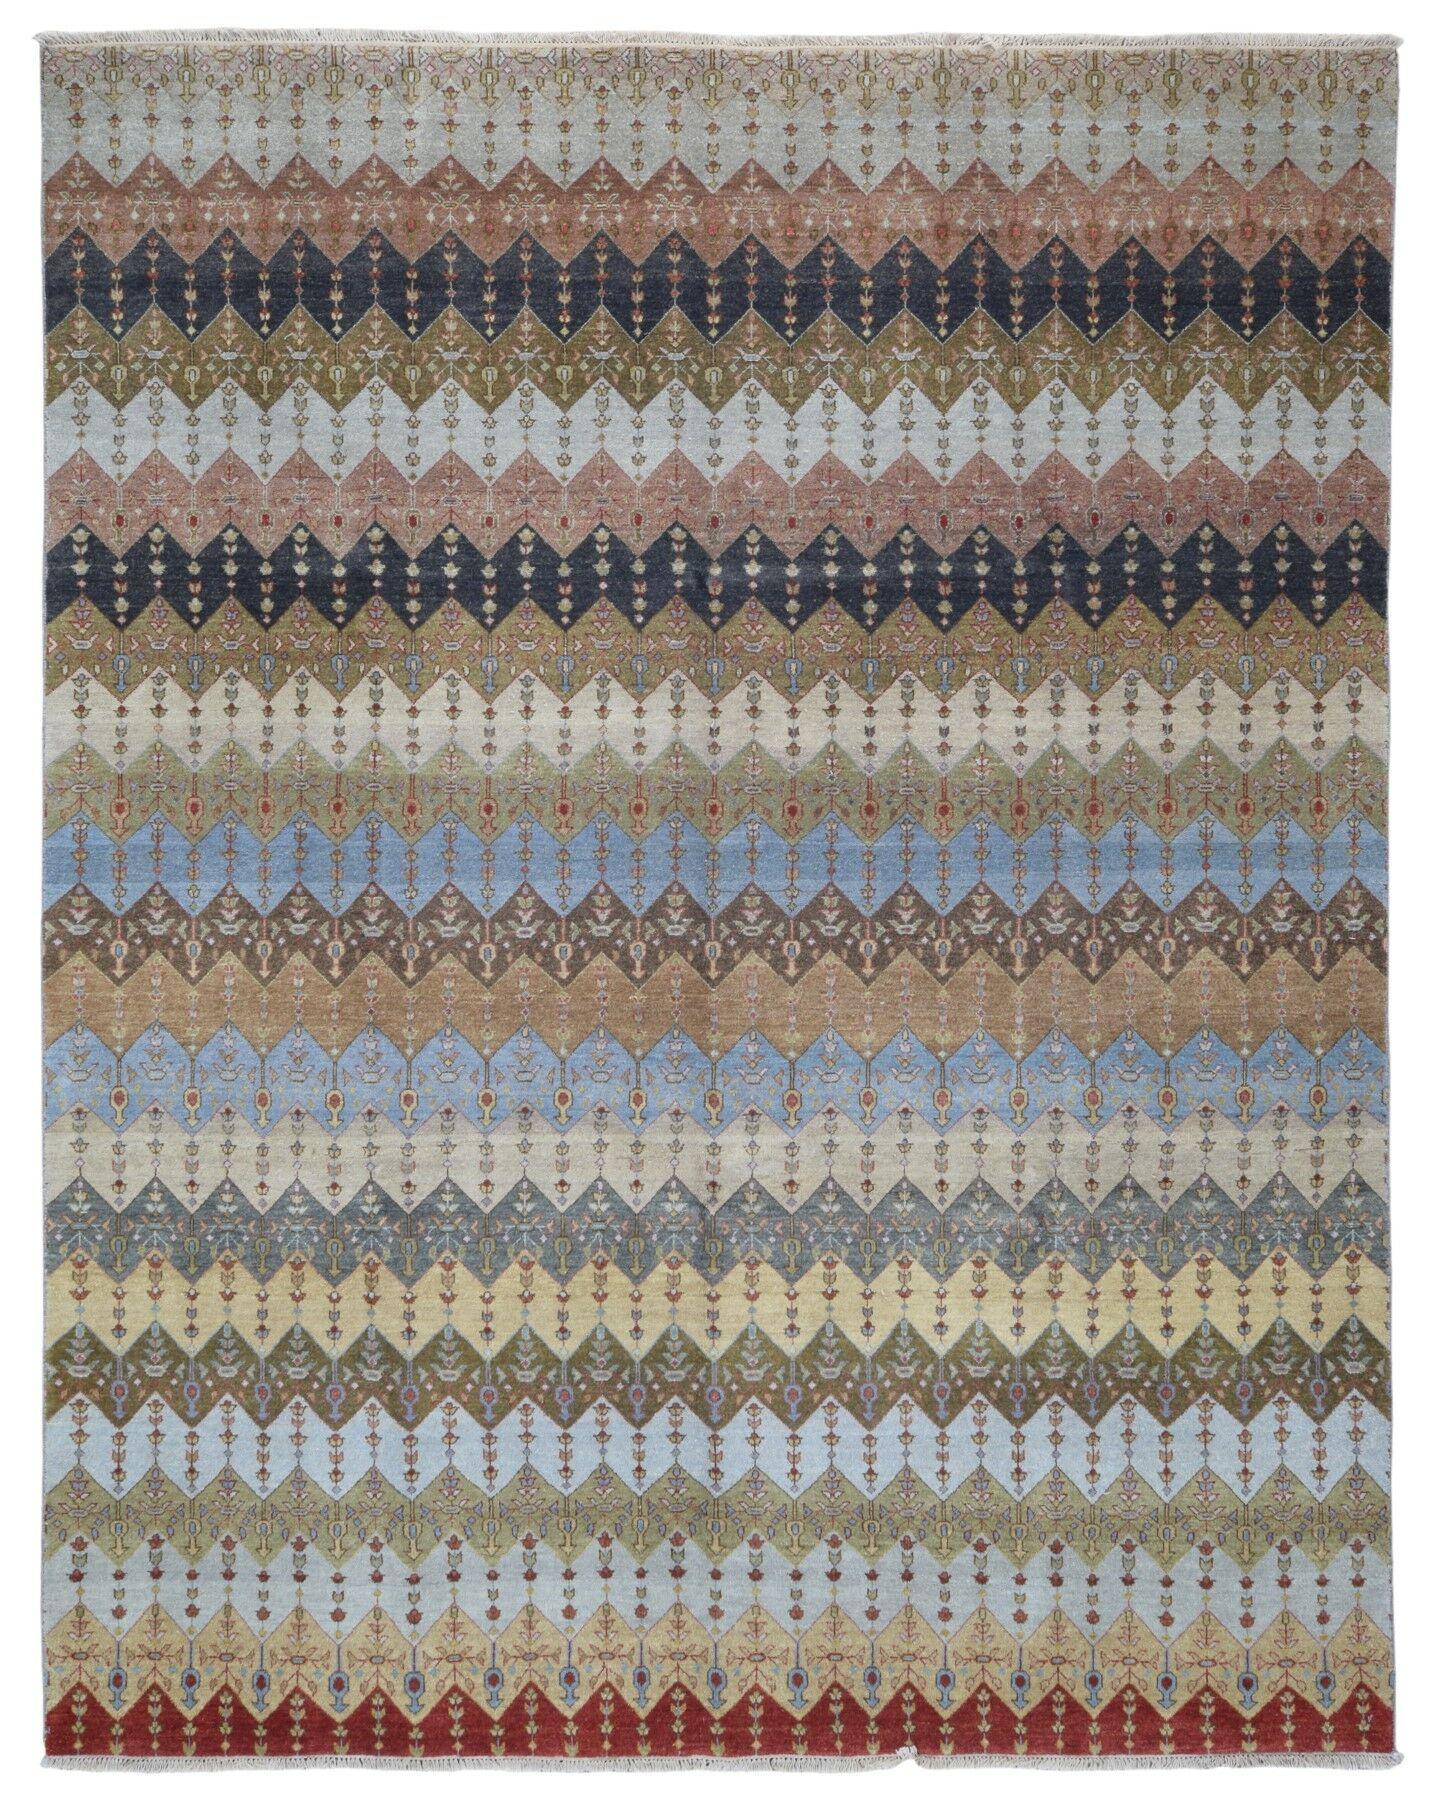 One-of-a-Kind Allenbie Modern Design Hand-Knotted Wool Beige/Blue Area Rug